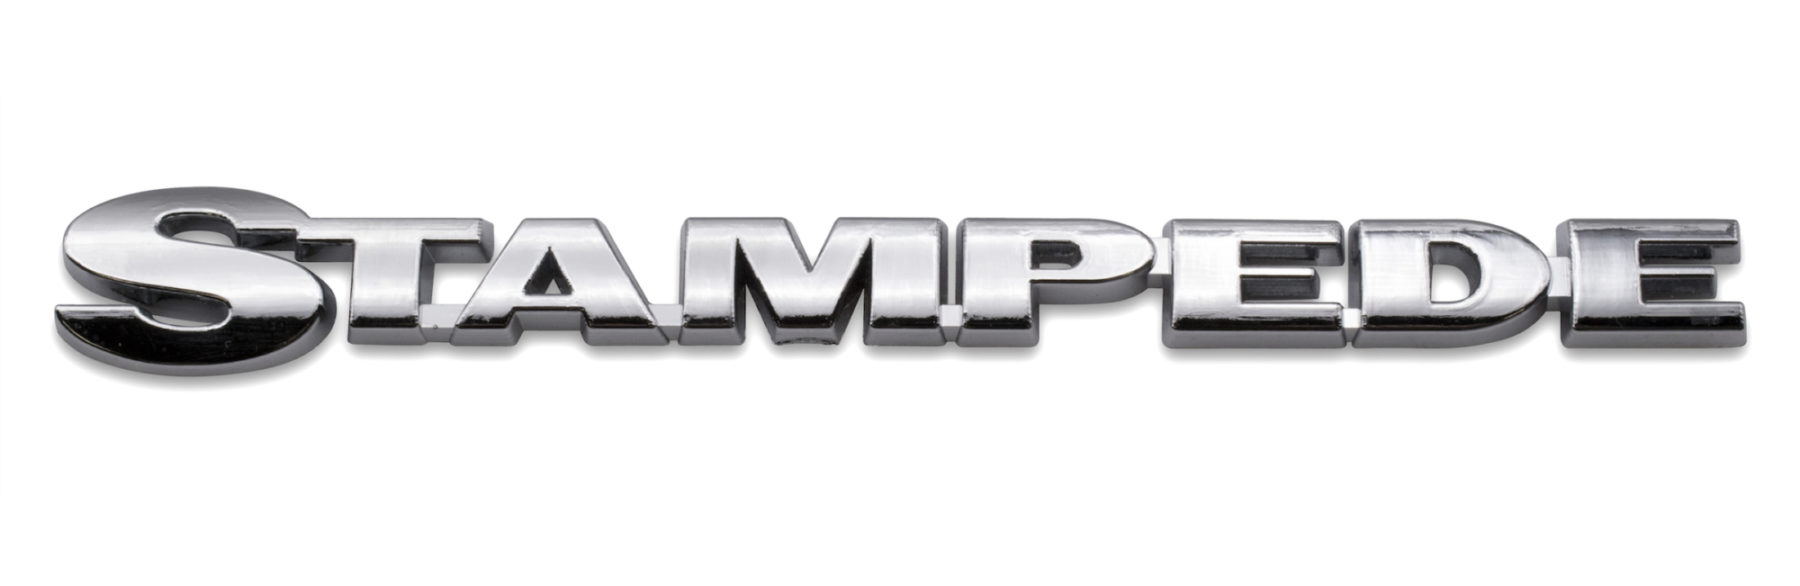 Custom Chrome Auto Emblems Free Quote | Elektroplate